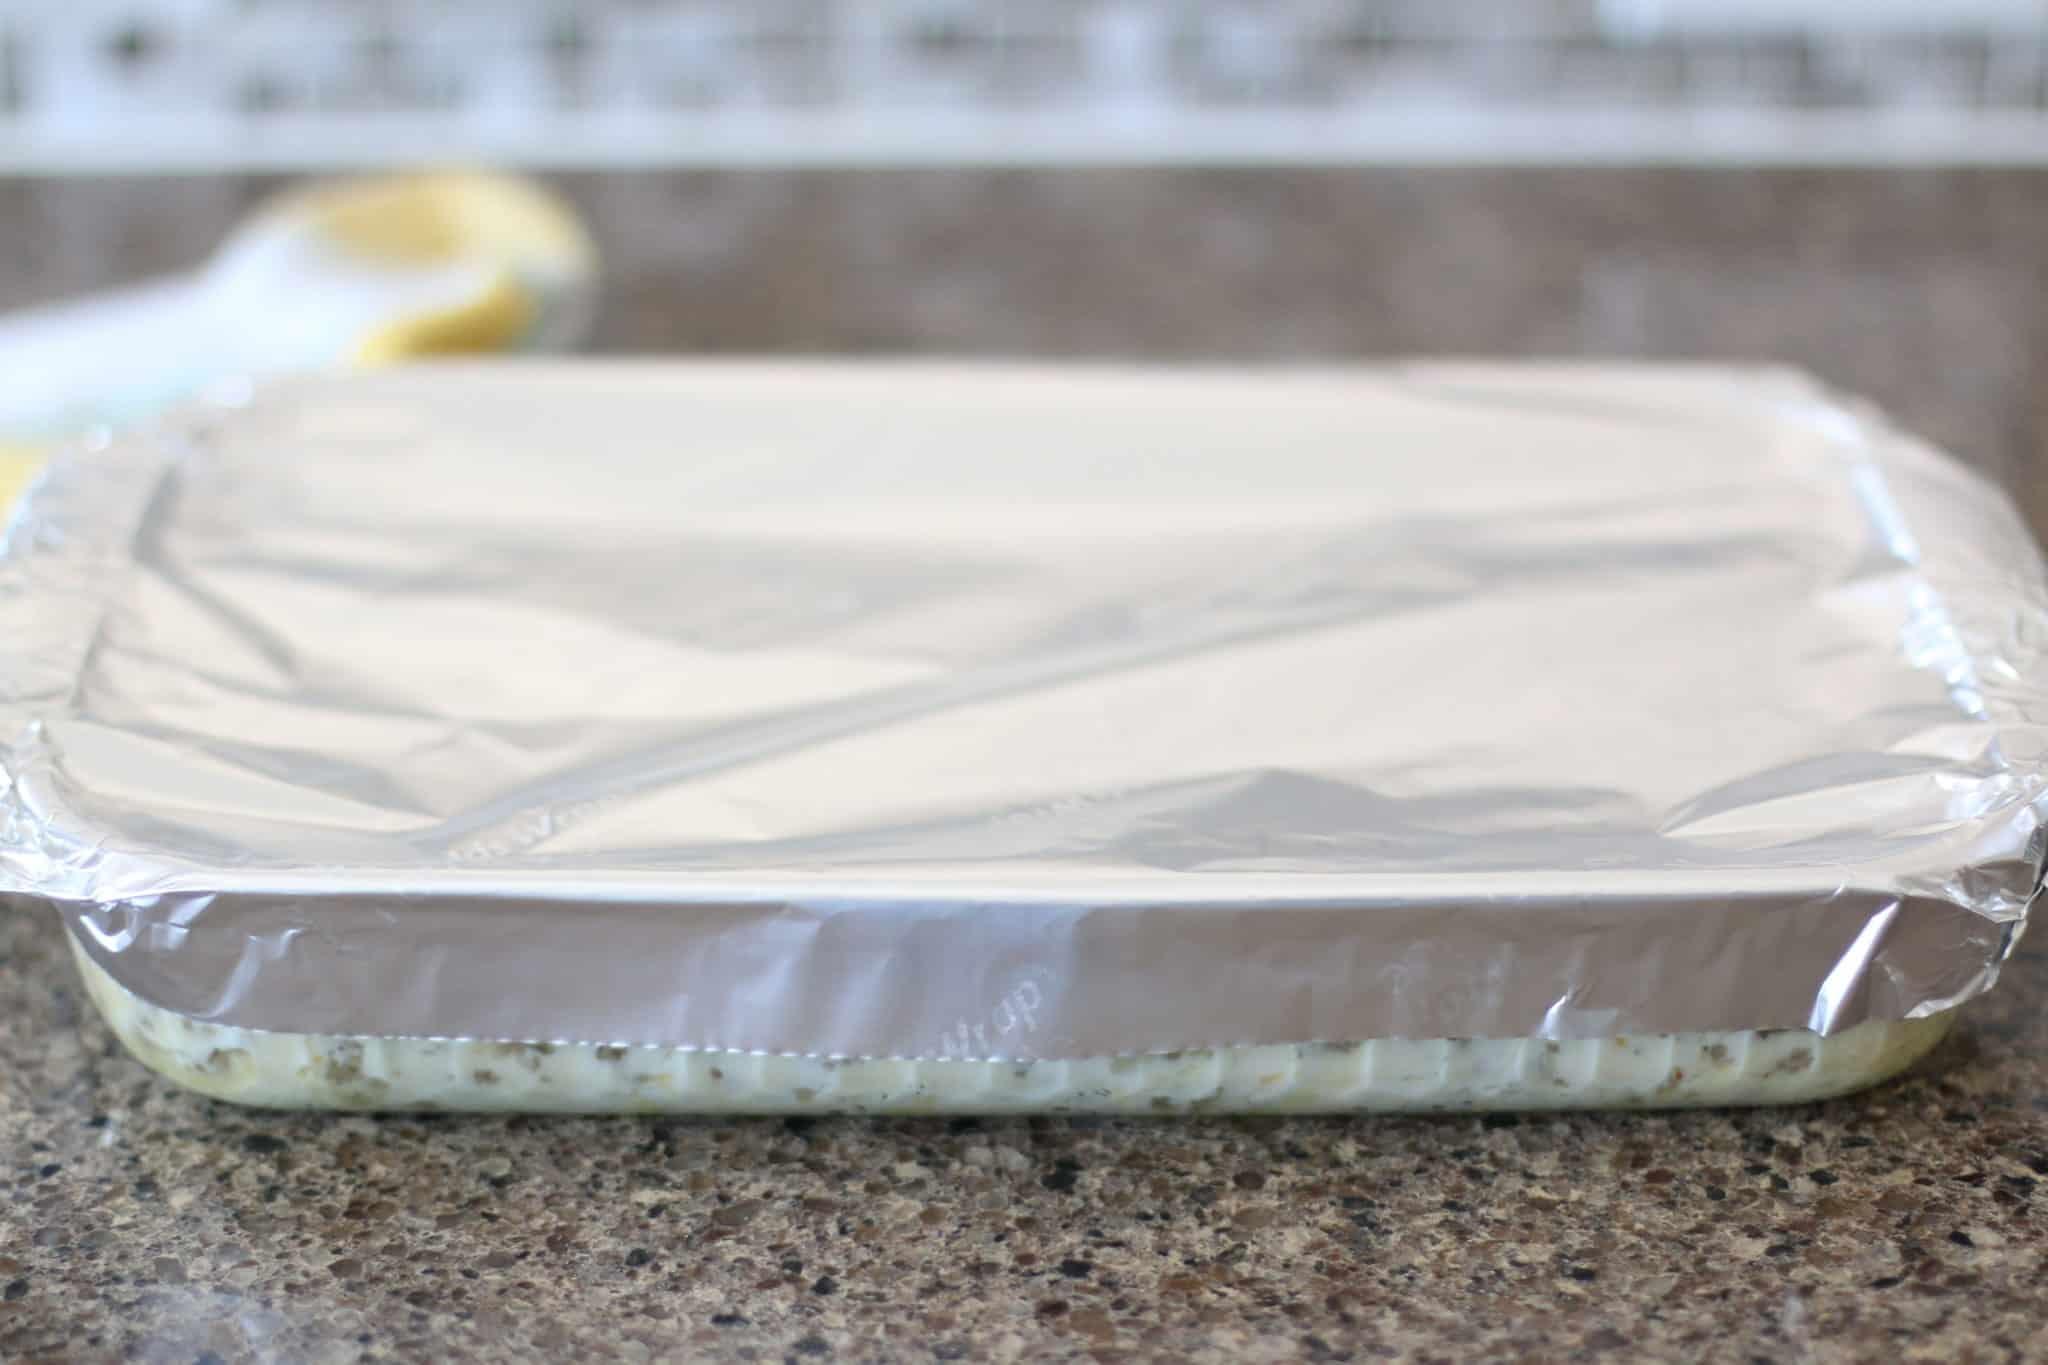 aluminum foil covered baking dish.